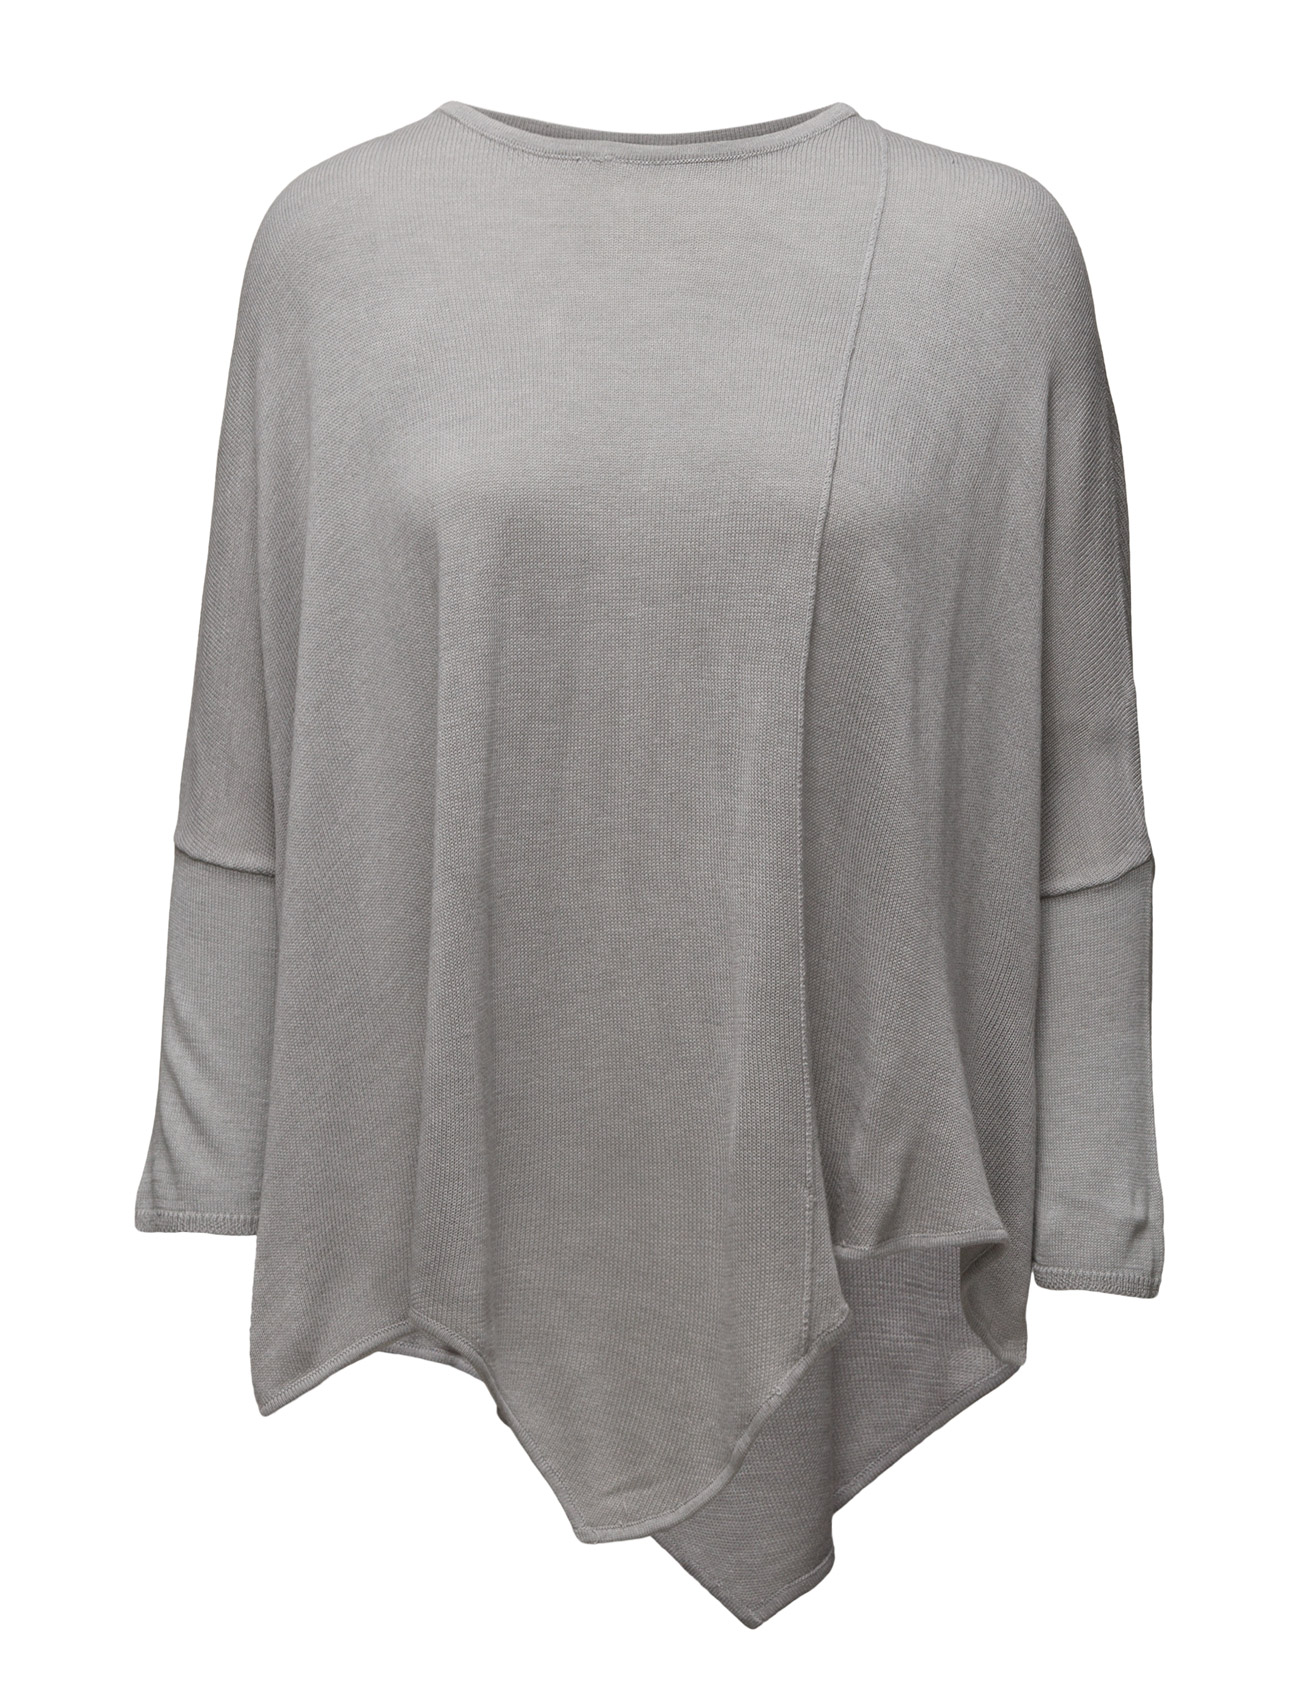 Knit Blouse With Visible Seam Saint Tropez Sweatshirts til Damer i C.Grey M